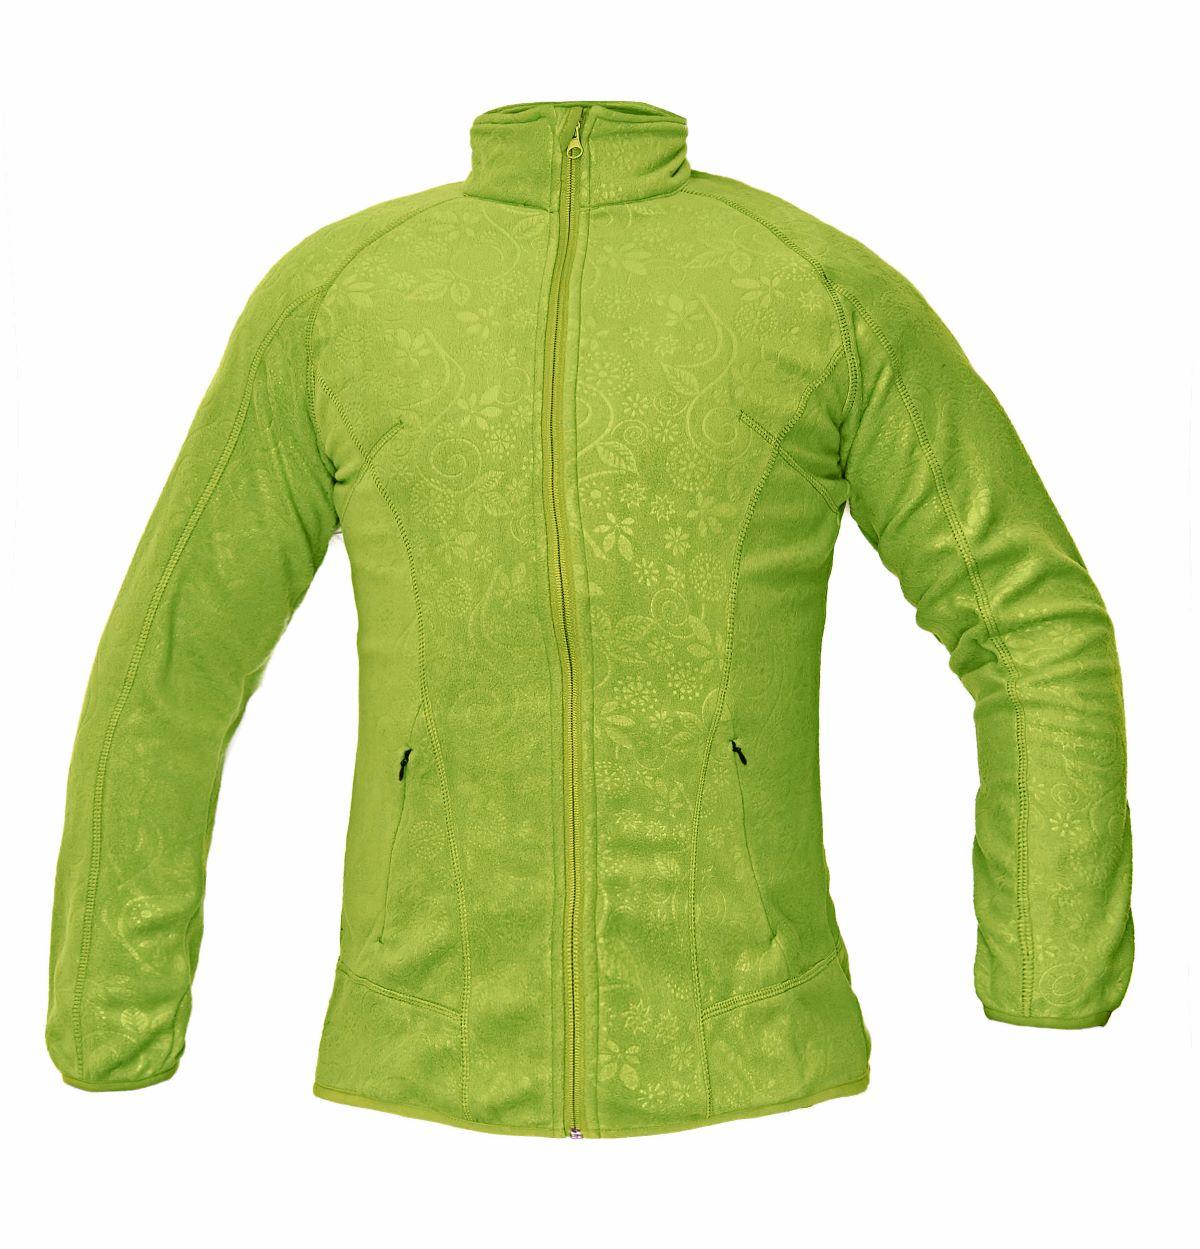 YOWIE fleece mikina zelená 03010323 10  M